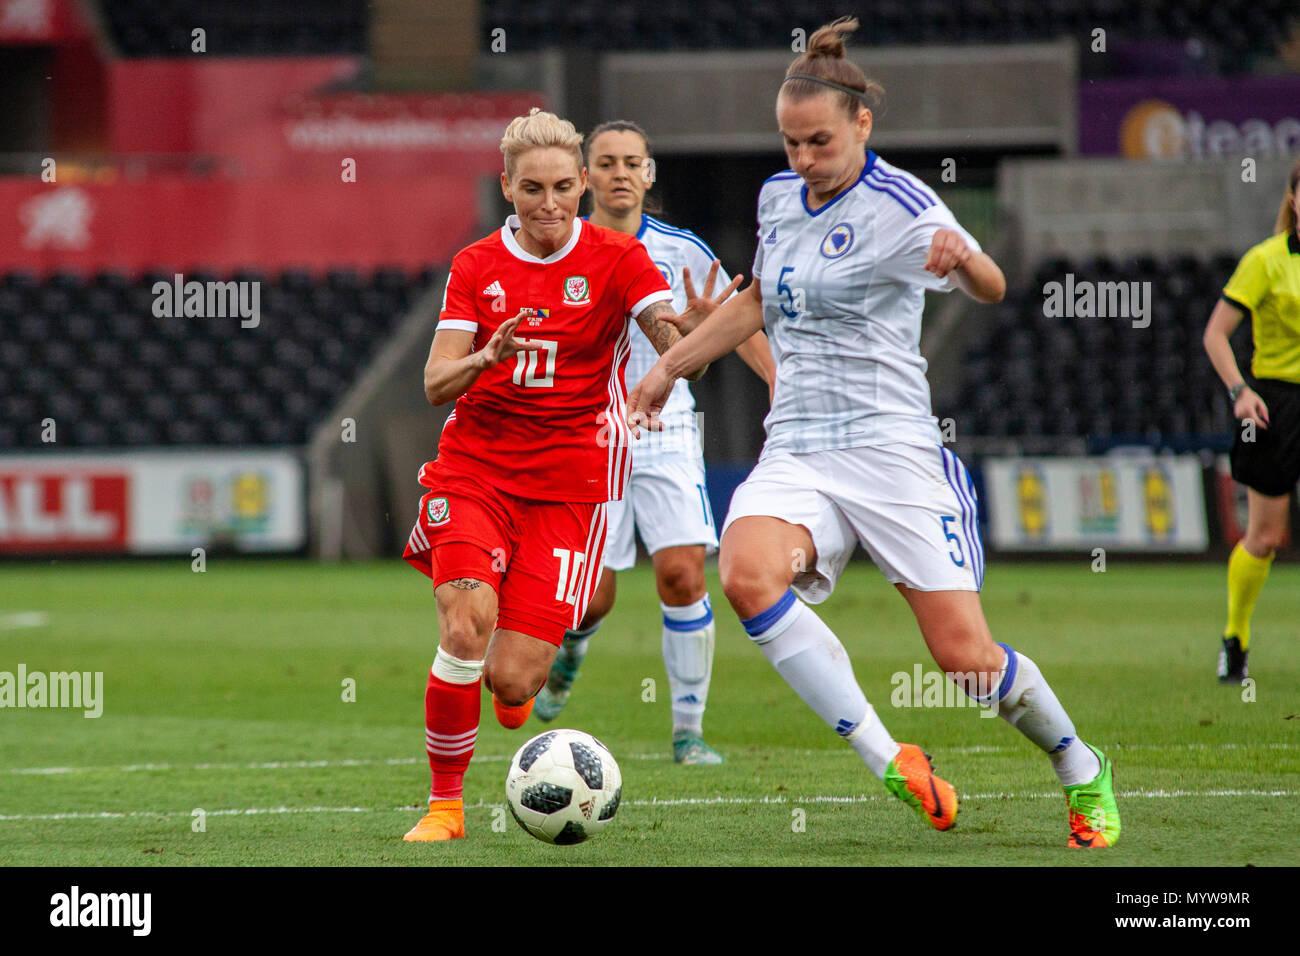 Swansea, Wales, UK. 7th June, 2018. Wales' Jess Fishlock faces Bosnia-Herzegovina at the Liberty Stadium. Lewis Mitchell/Alamy Live News. - Stock Image